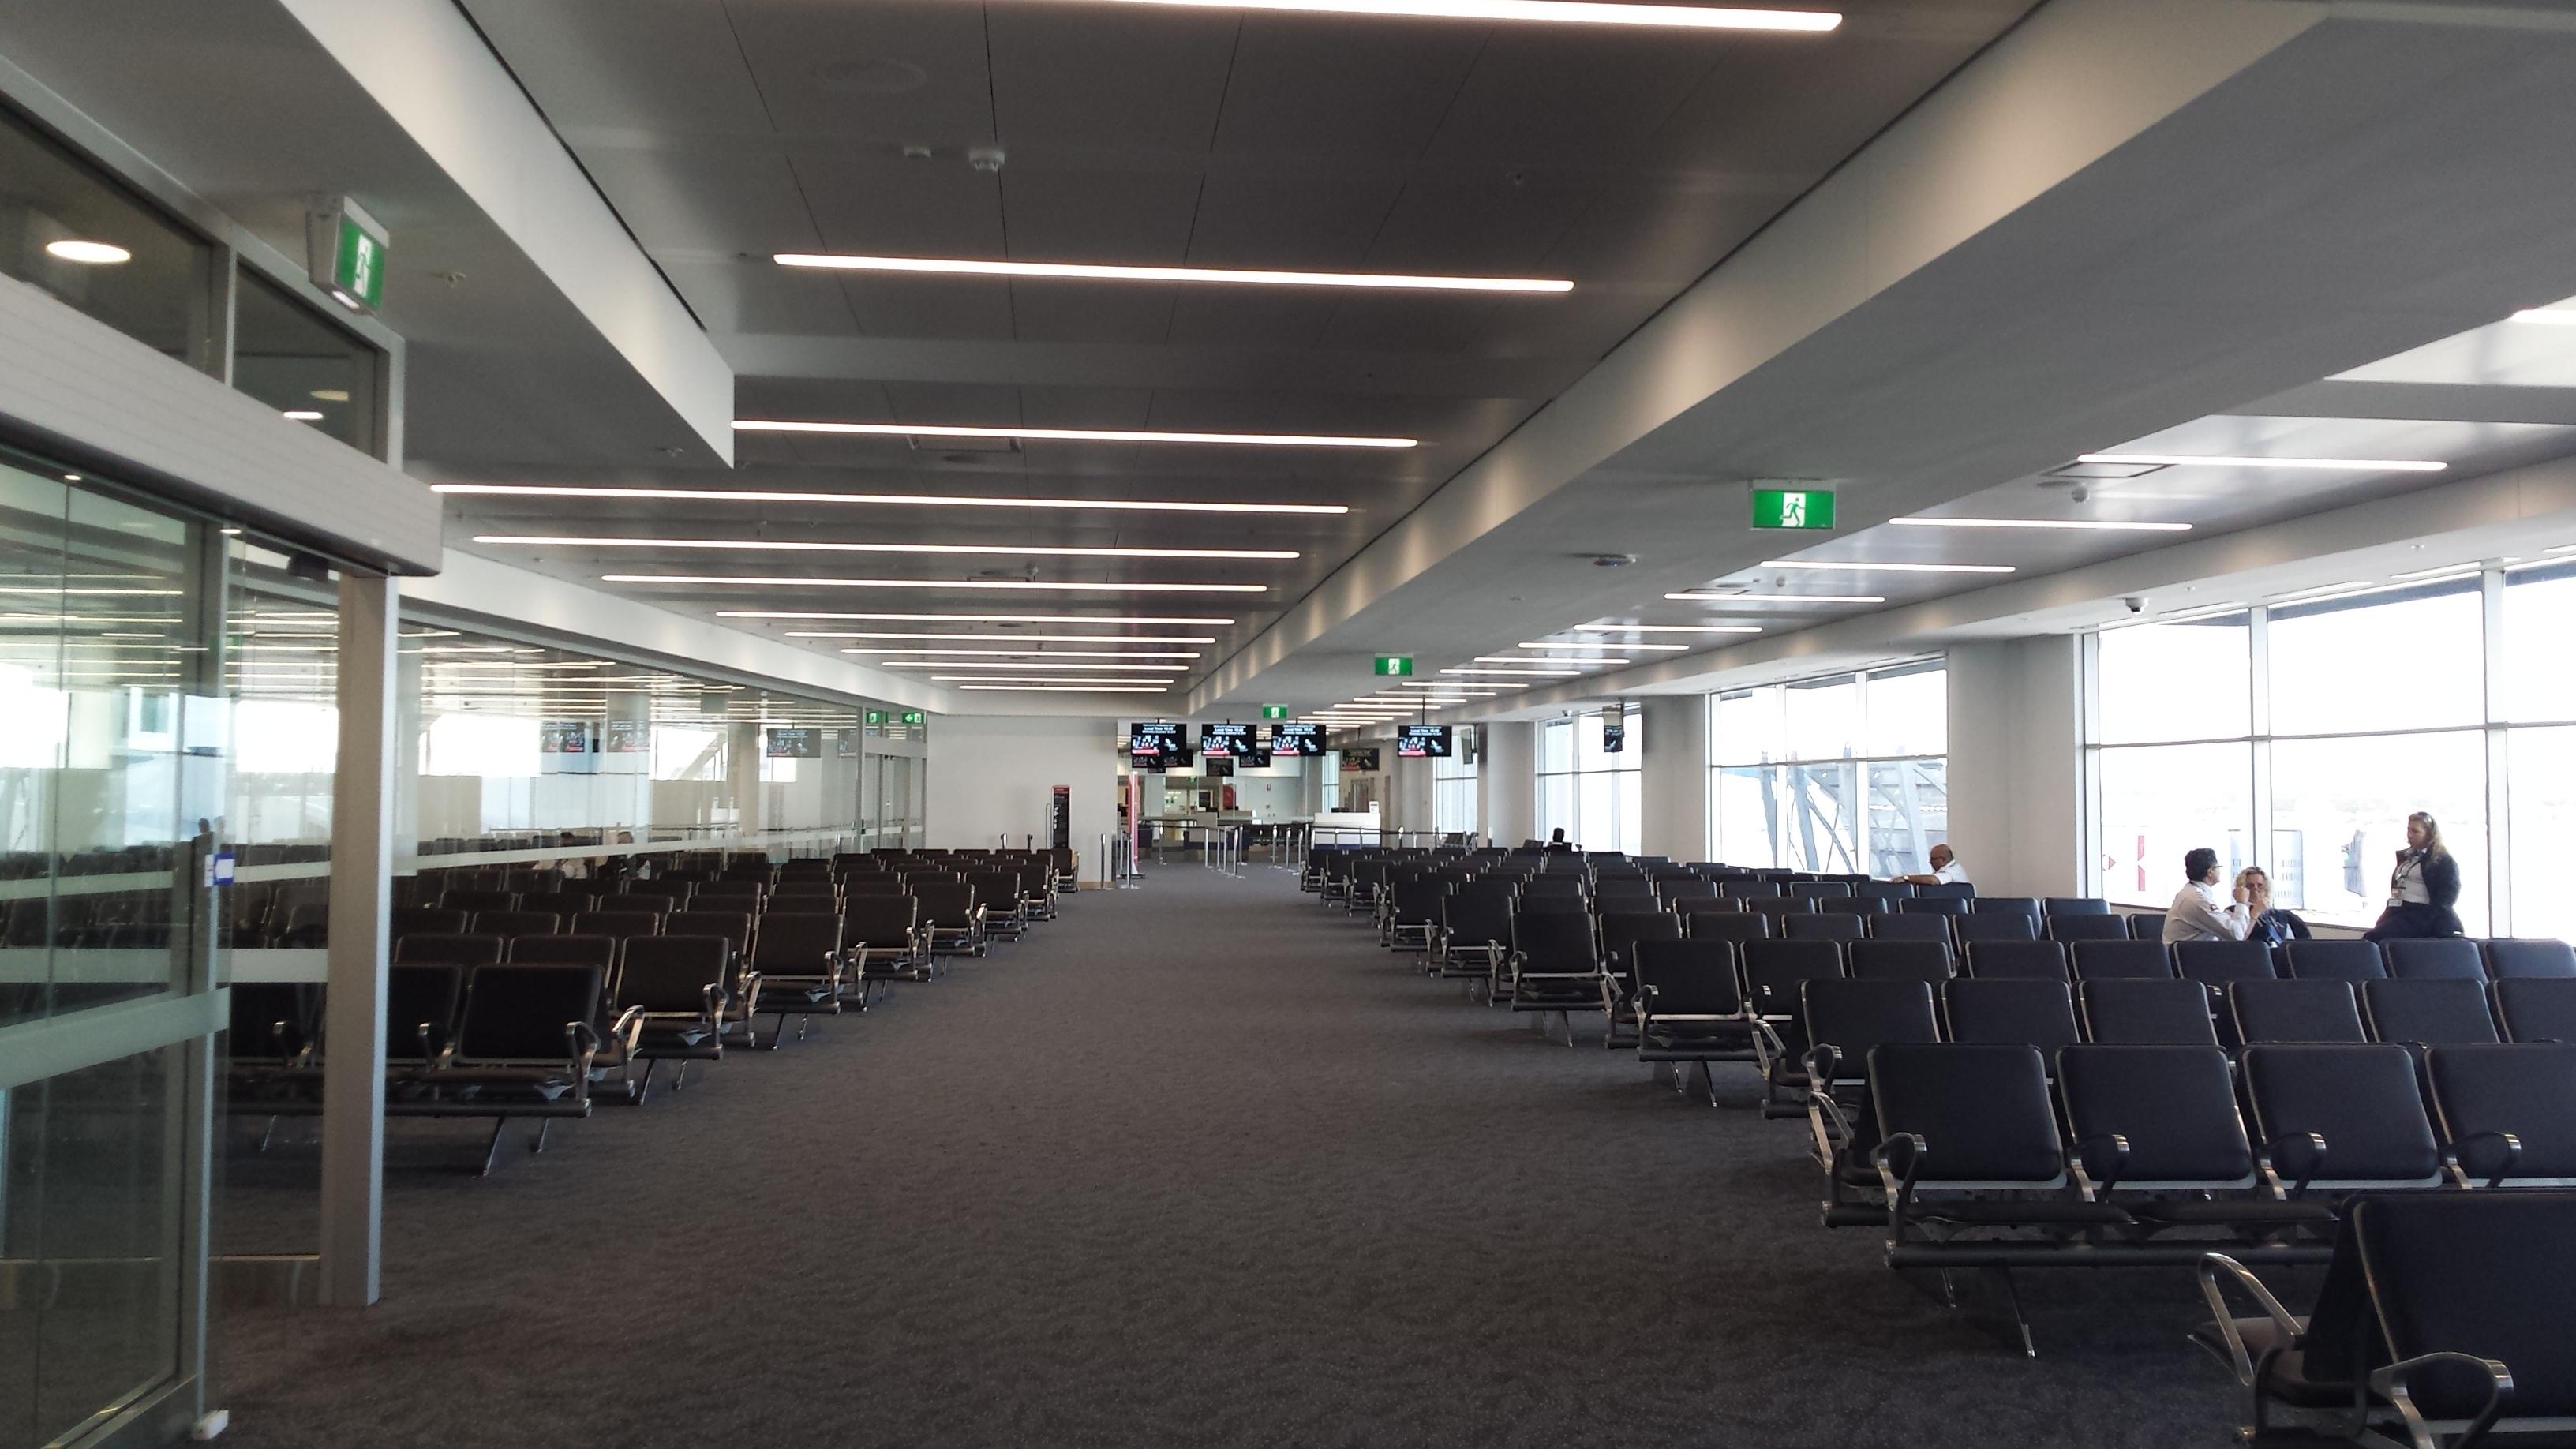 T1 Concourse Bay 8-10